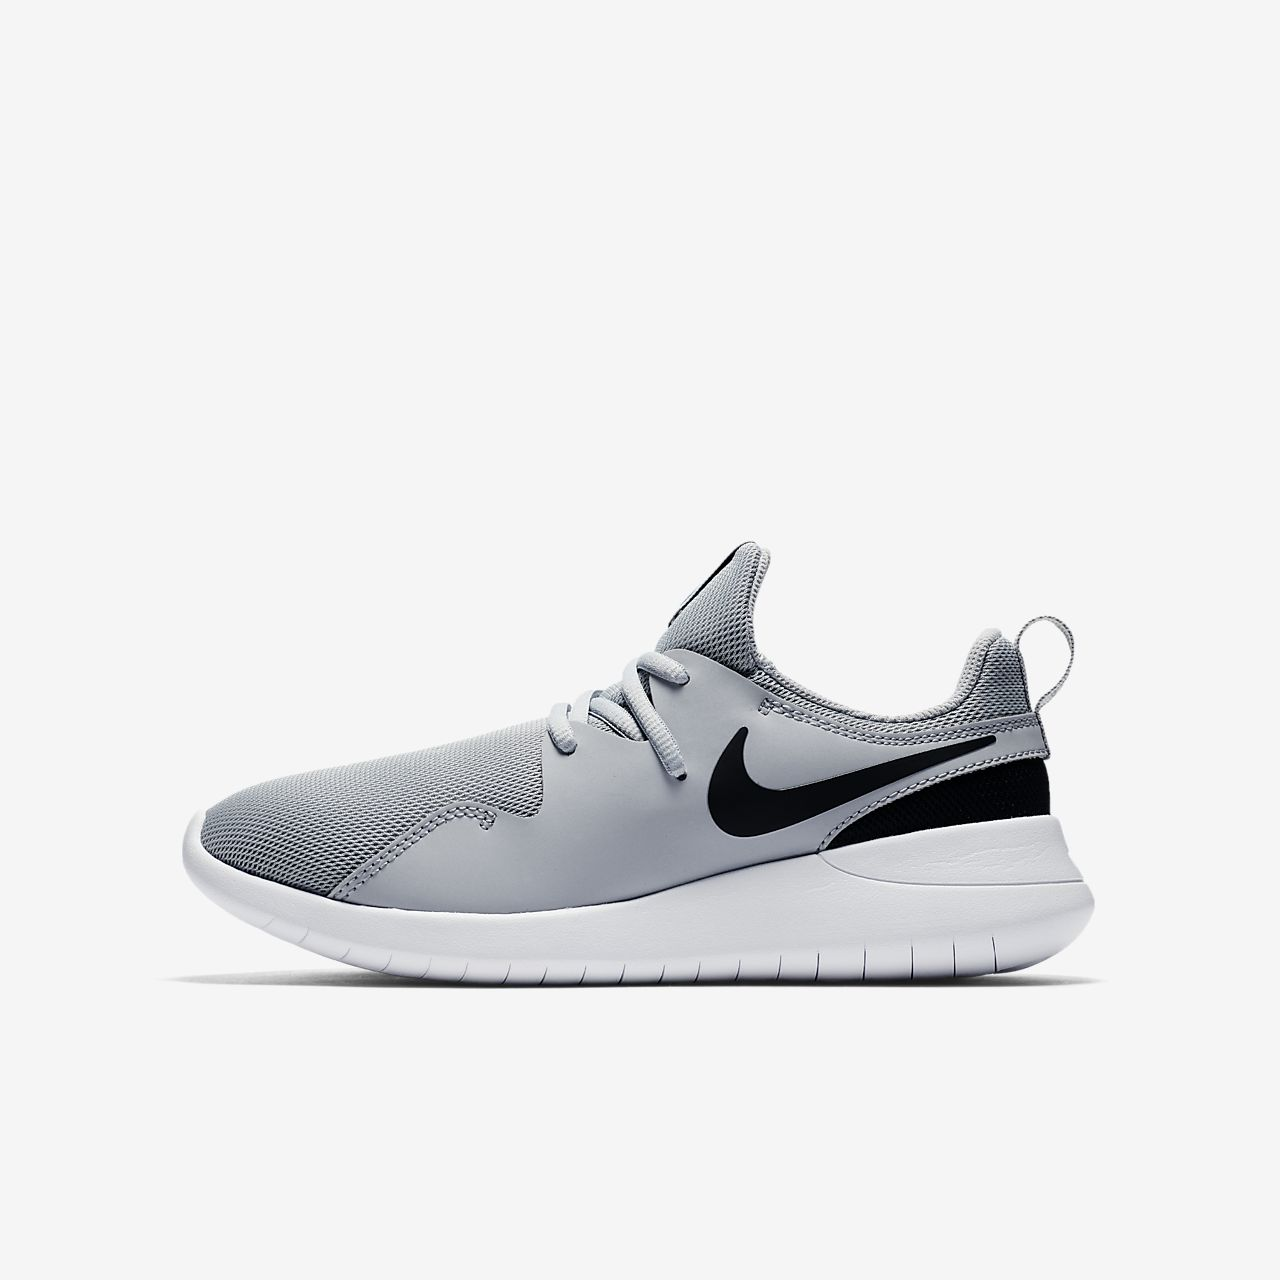 uk availability 02f52 d5e04 ... Scarpa Nike Tessen - Ragazzi